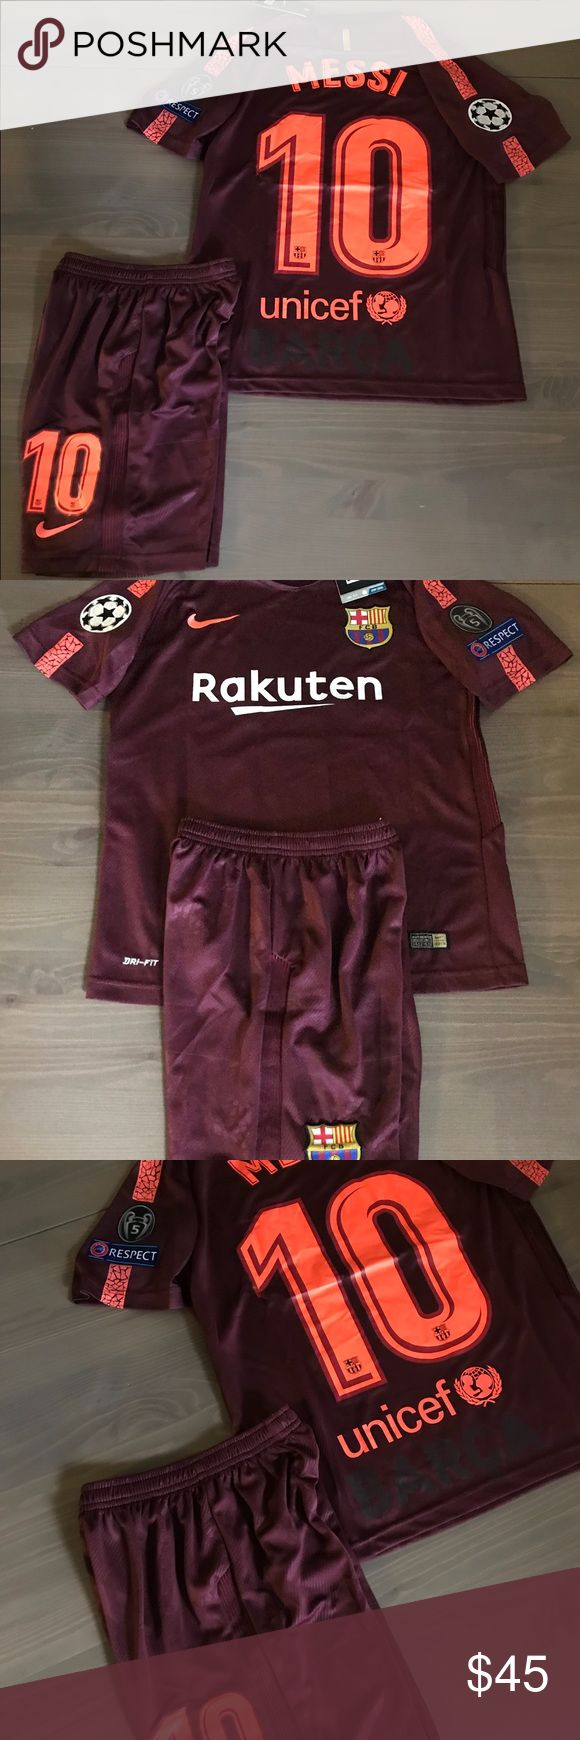 Kids kit Barcelona burgundy Messi #10 nike soccer Kids kit Barcelona Away burgundy Messi #10 nike soccer champions league jersey+short Size: 10-11 Yrs. 8-9 Yrs. Nike Matching Sets